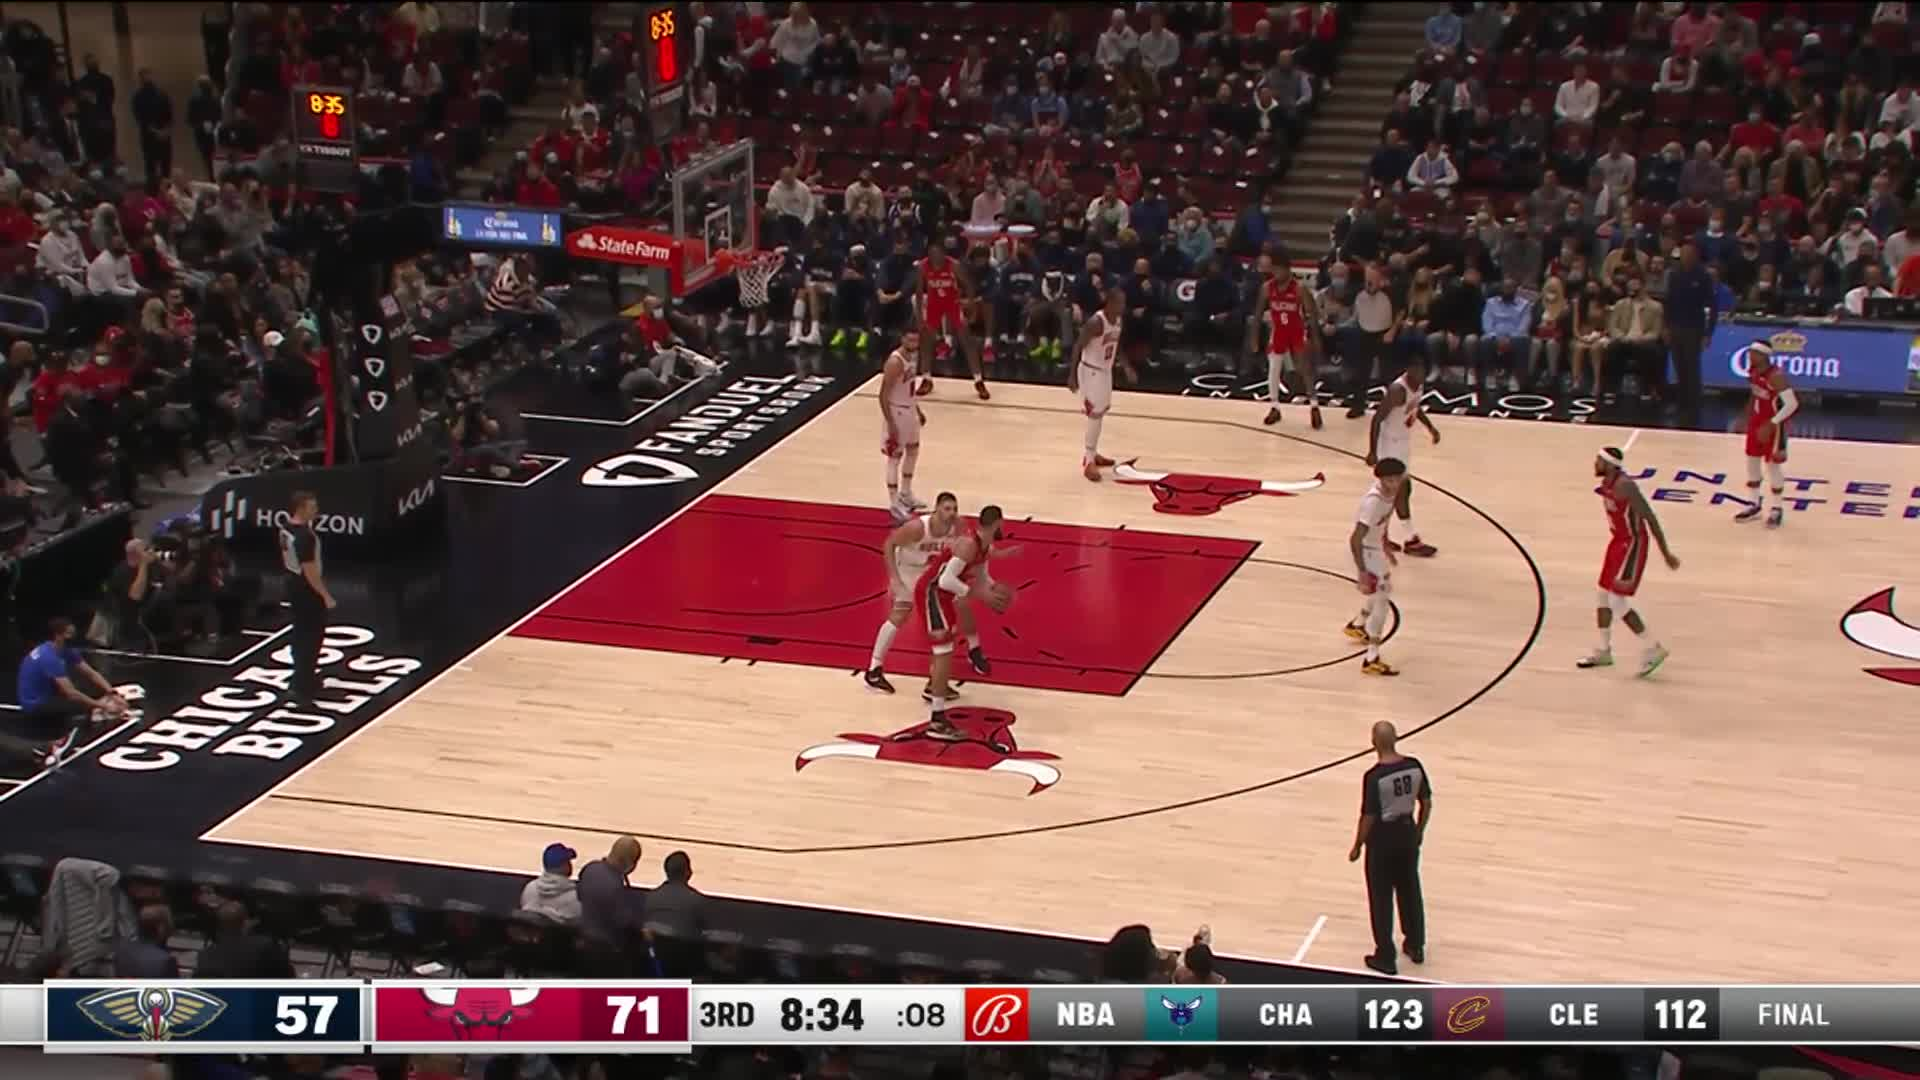 Jonas Valanciunas lays it in to trim the lead | Pelicans at Bulls 10-22-21